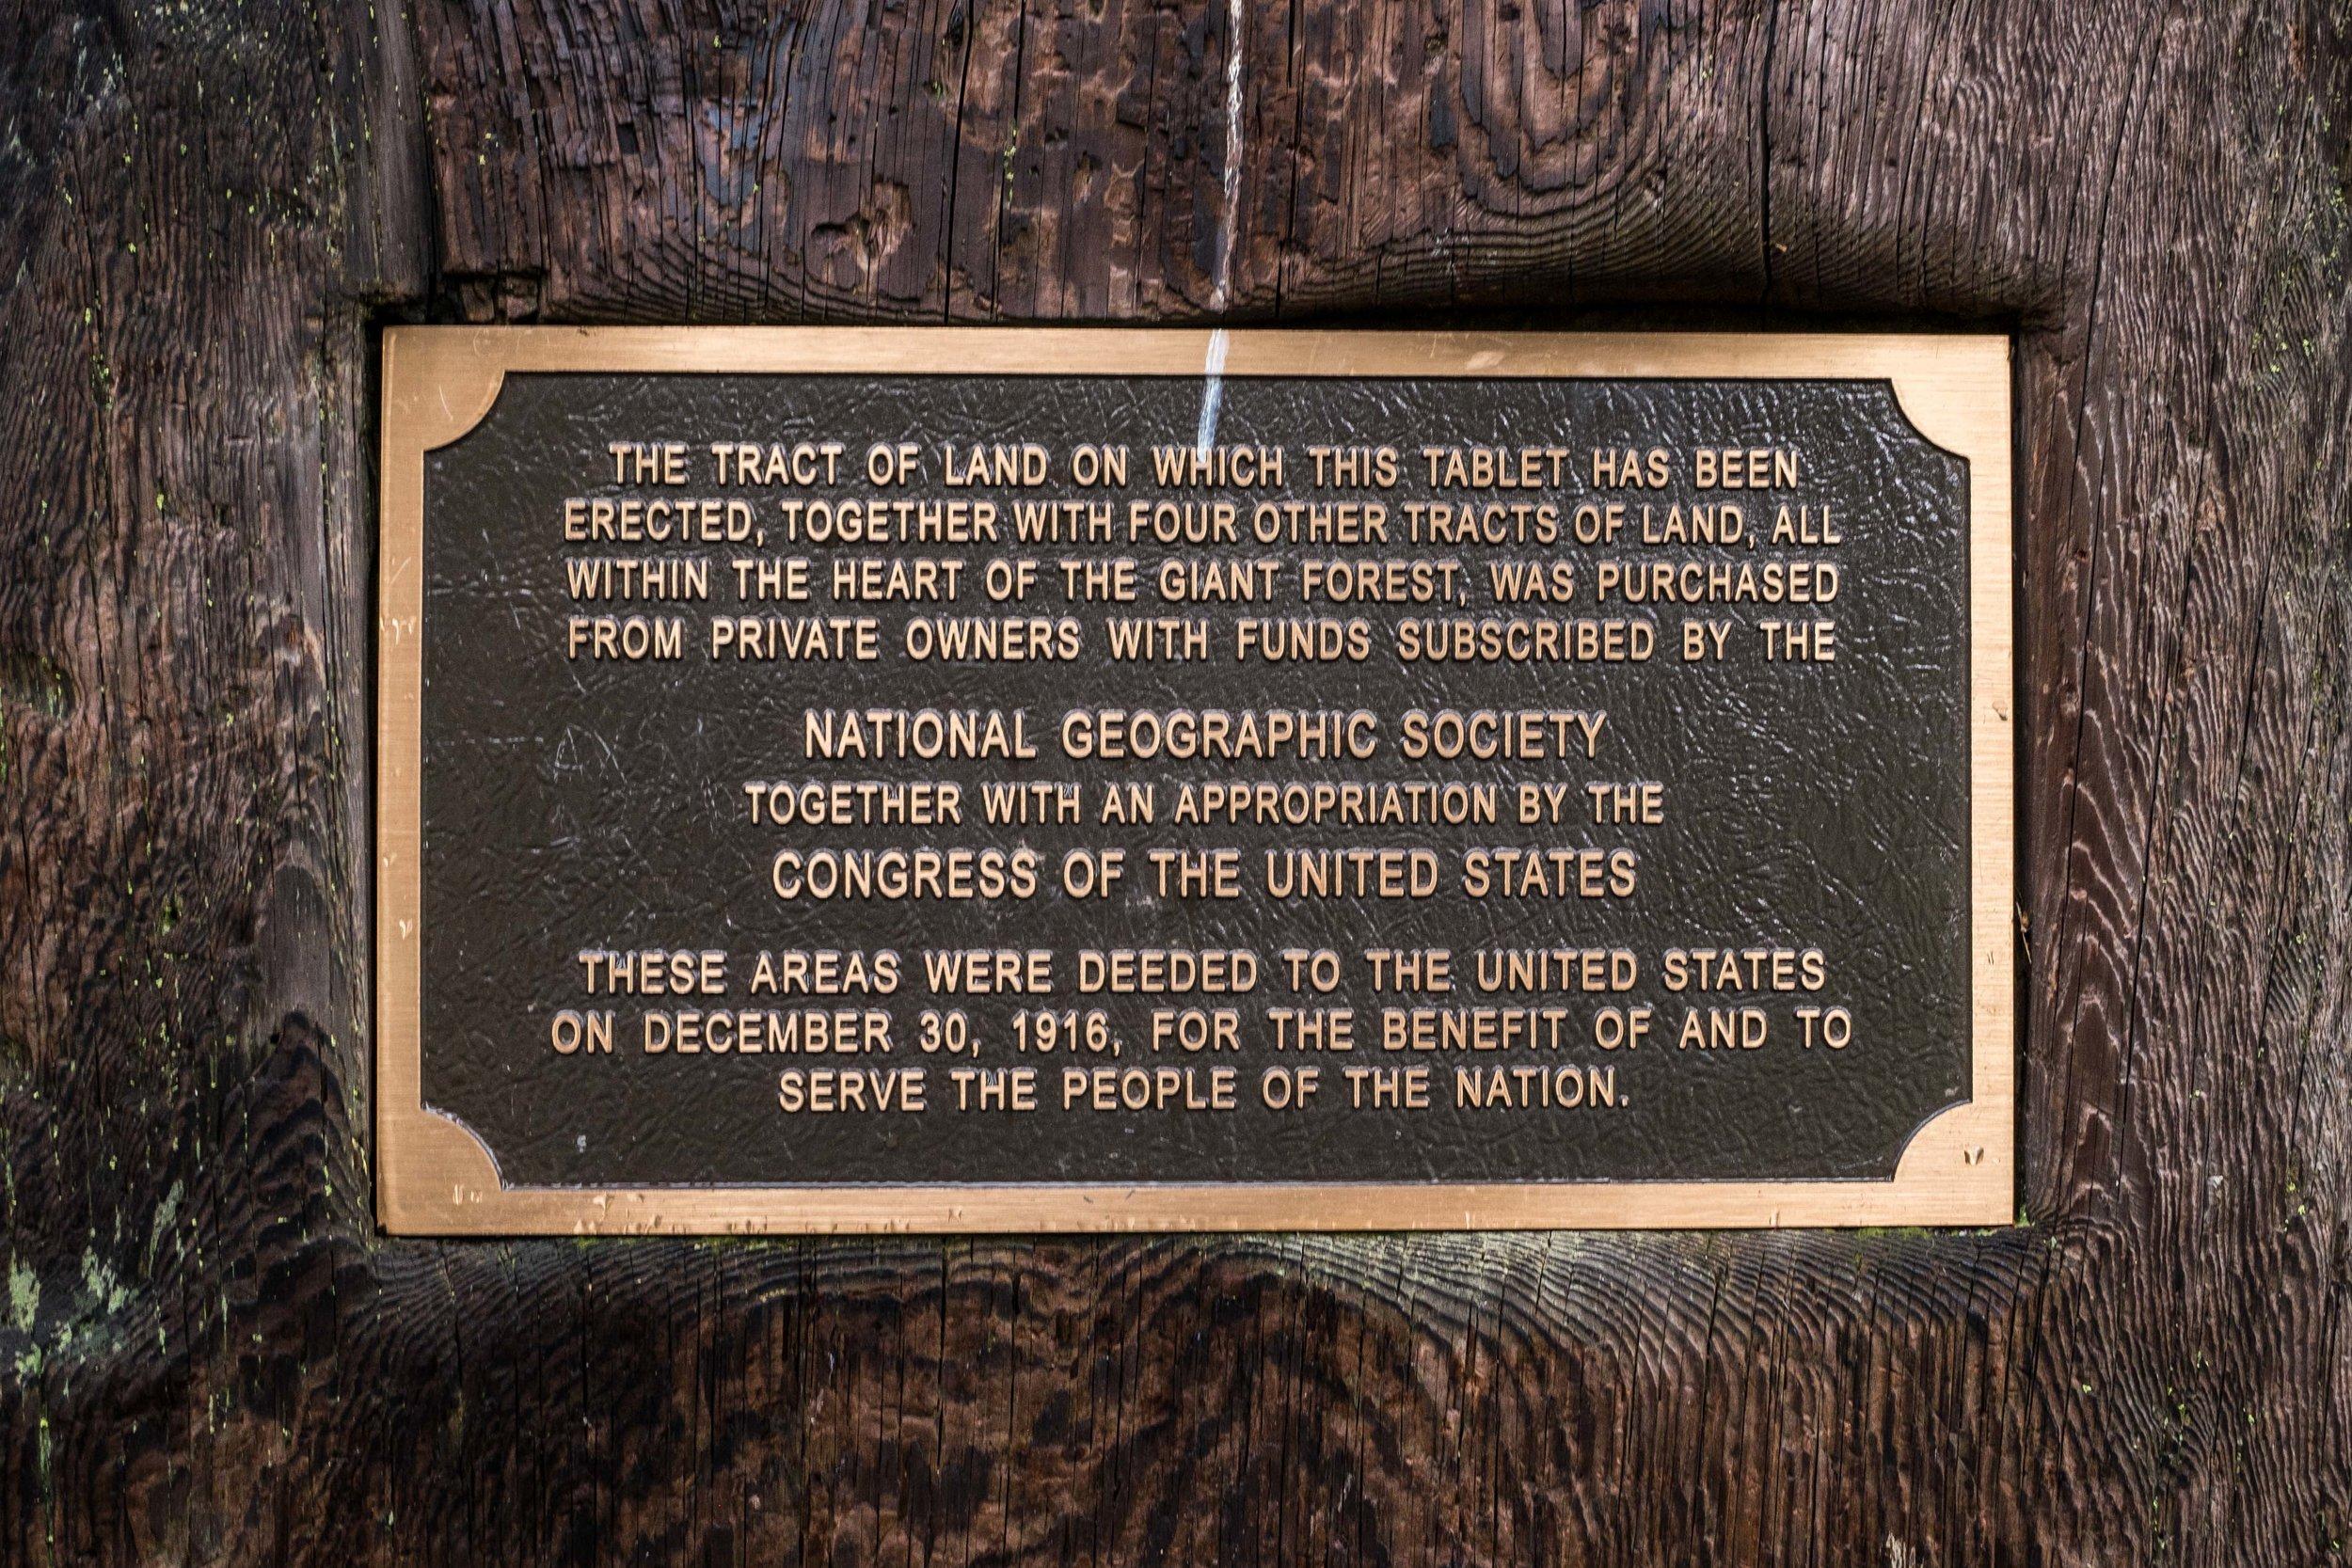 20160506-JI-Sequoia National Park-_DSF8928.jpg